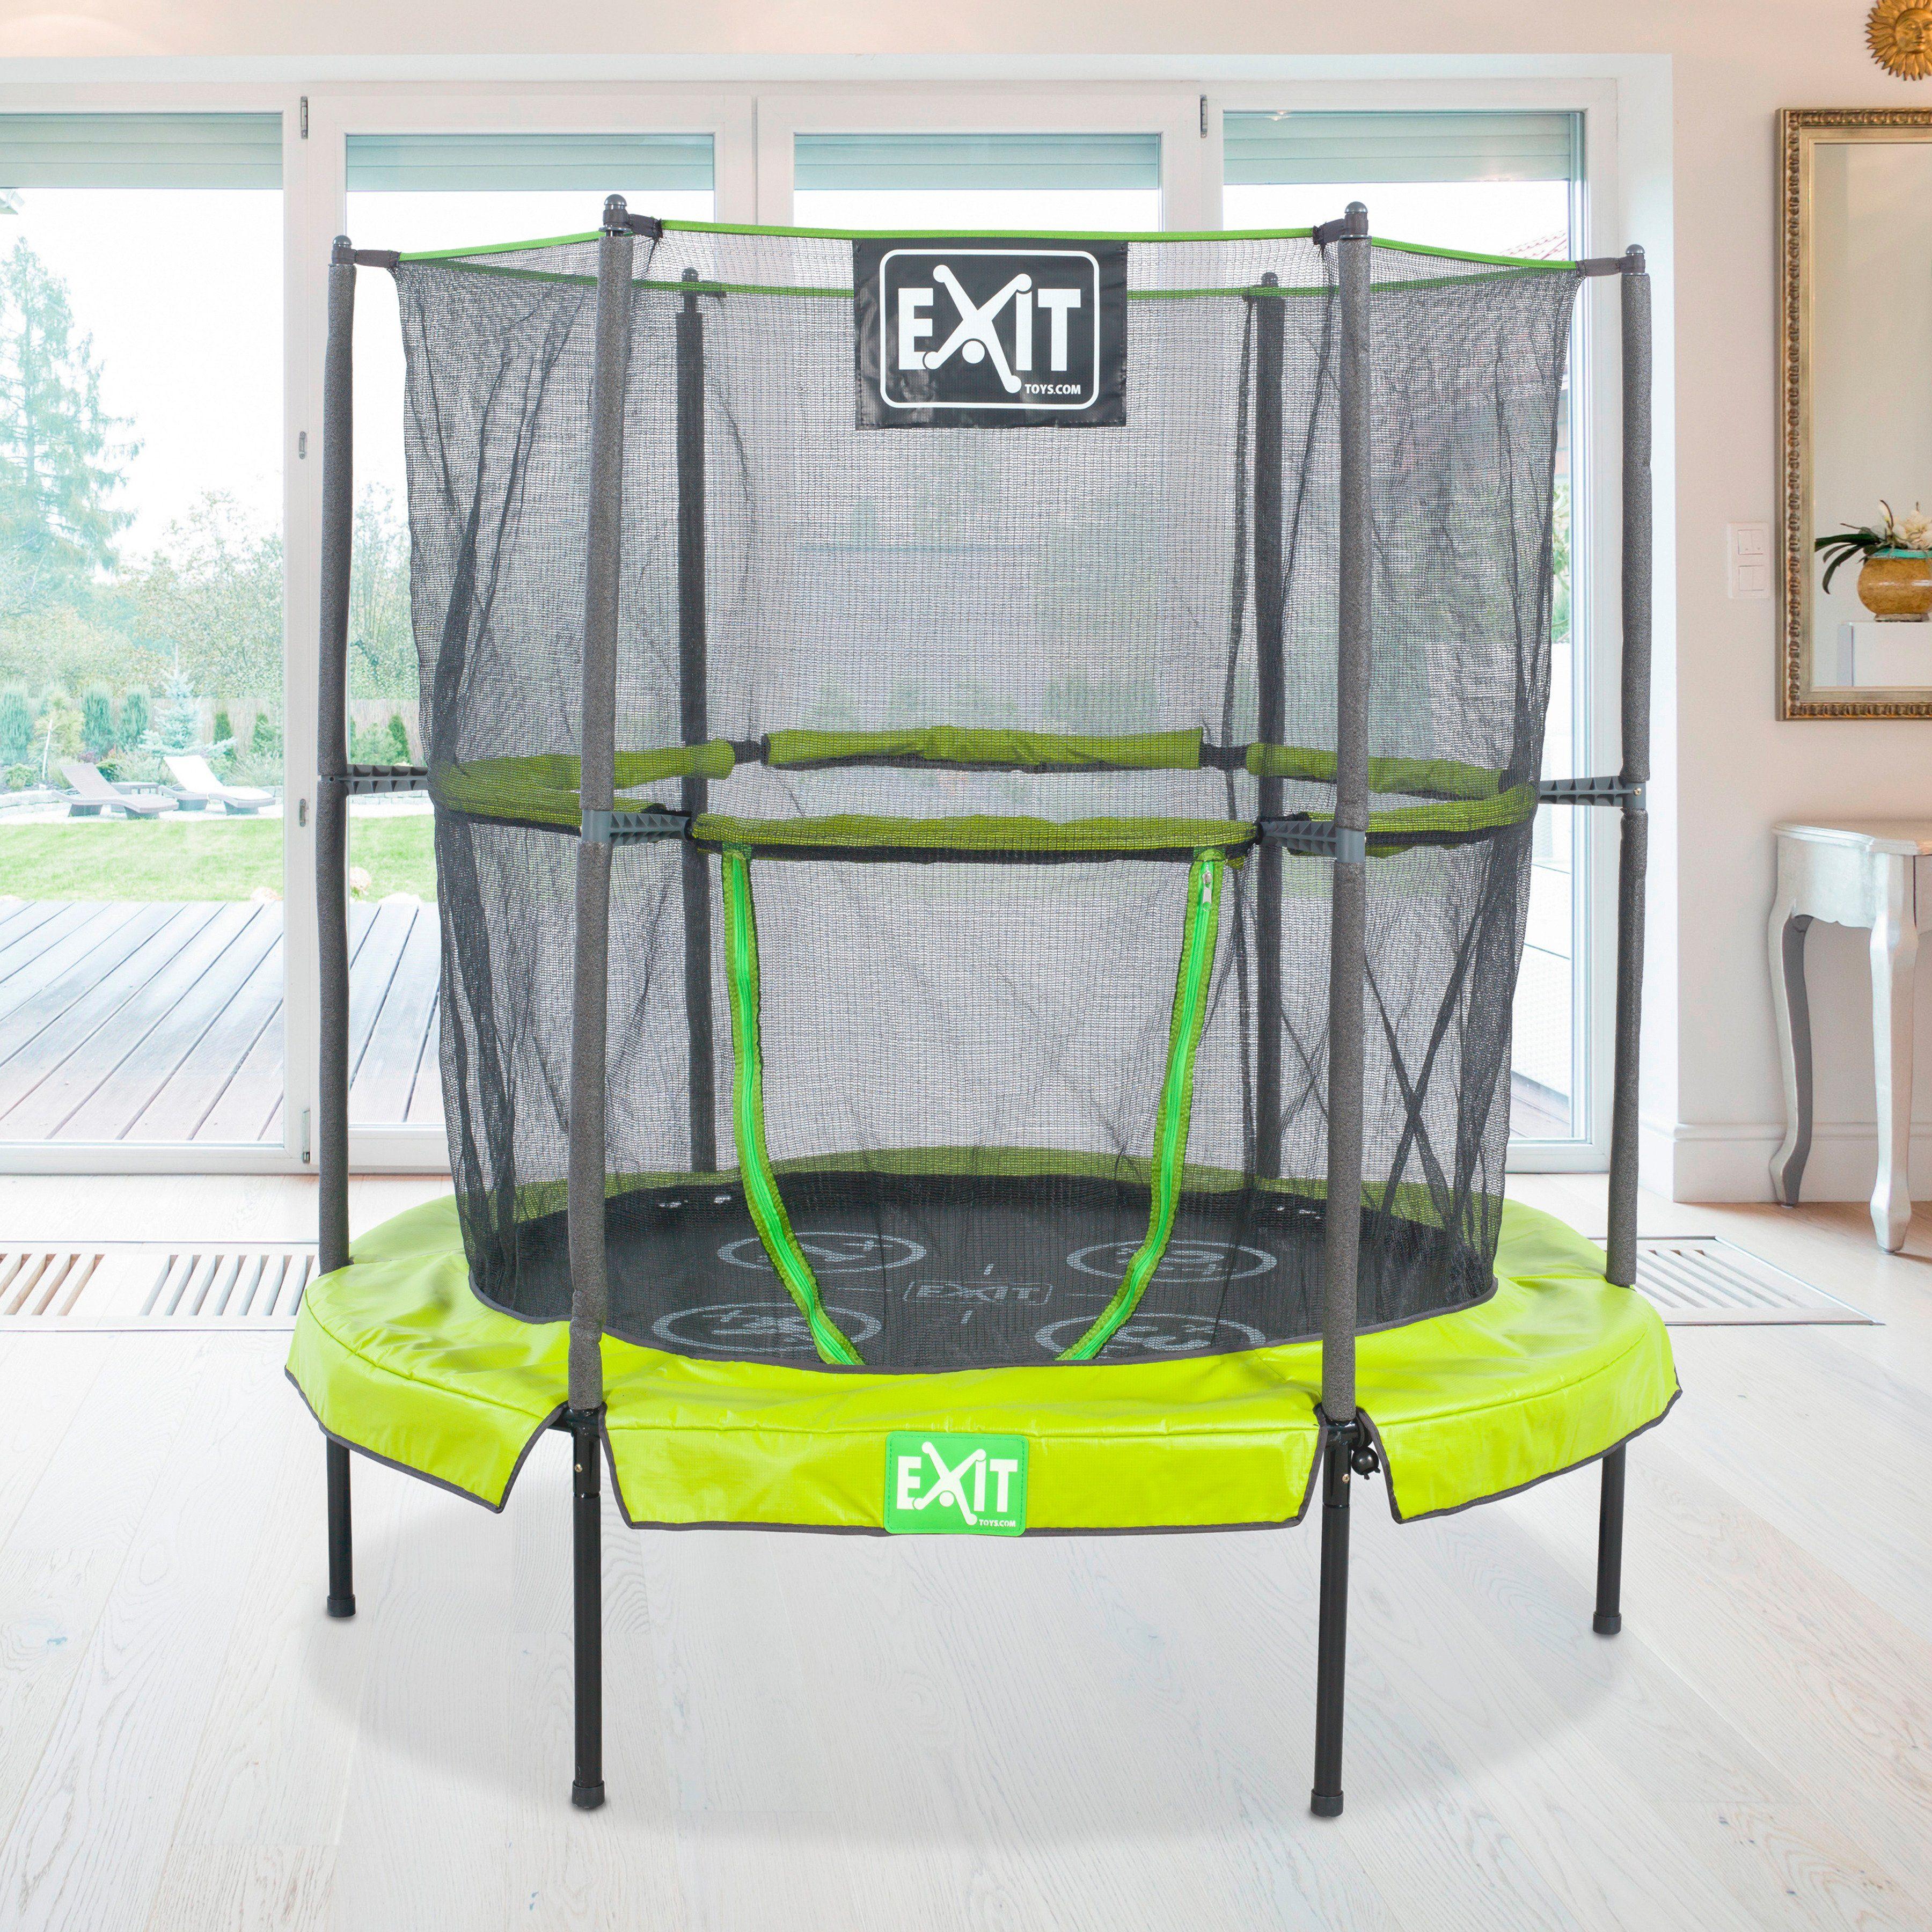 Trampolin »EXIT Bounzy Mini Trampoline« grün